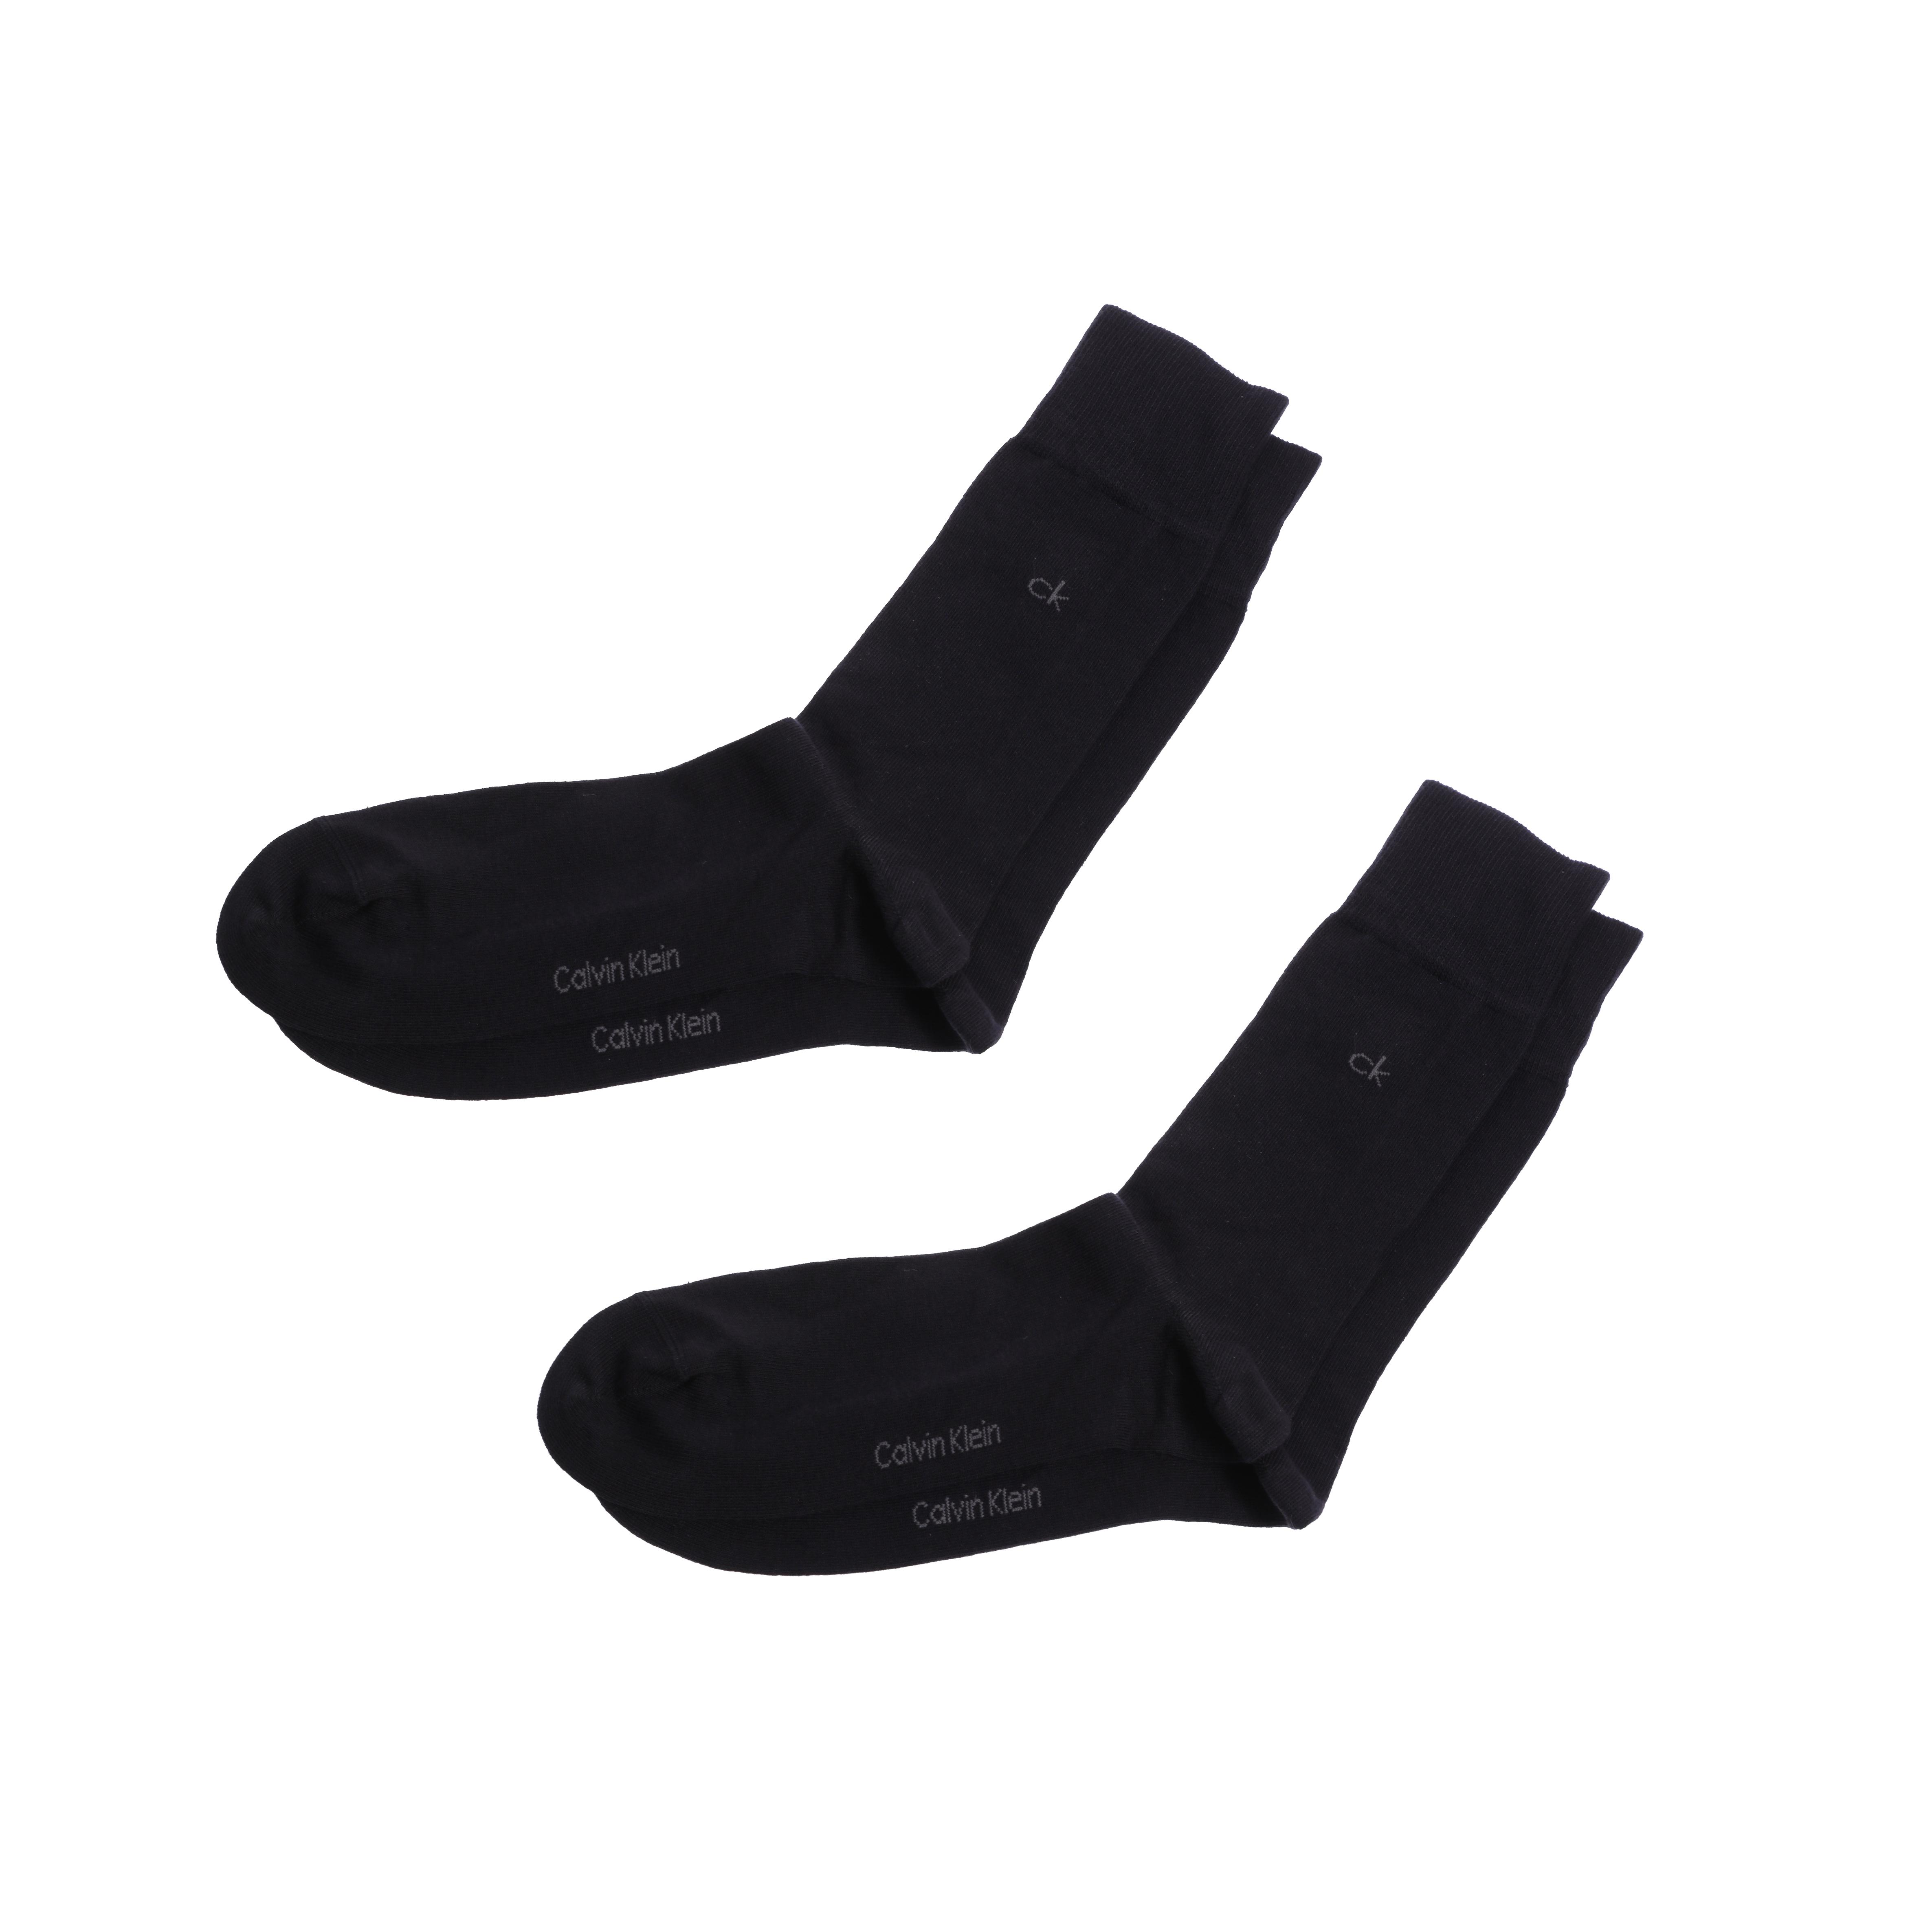 CK UNDERWEAR – Ανδρικό σετ κάλτσες Calvin Klein μαύρες